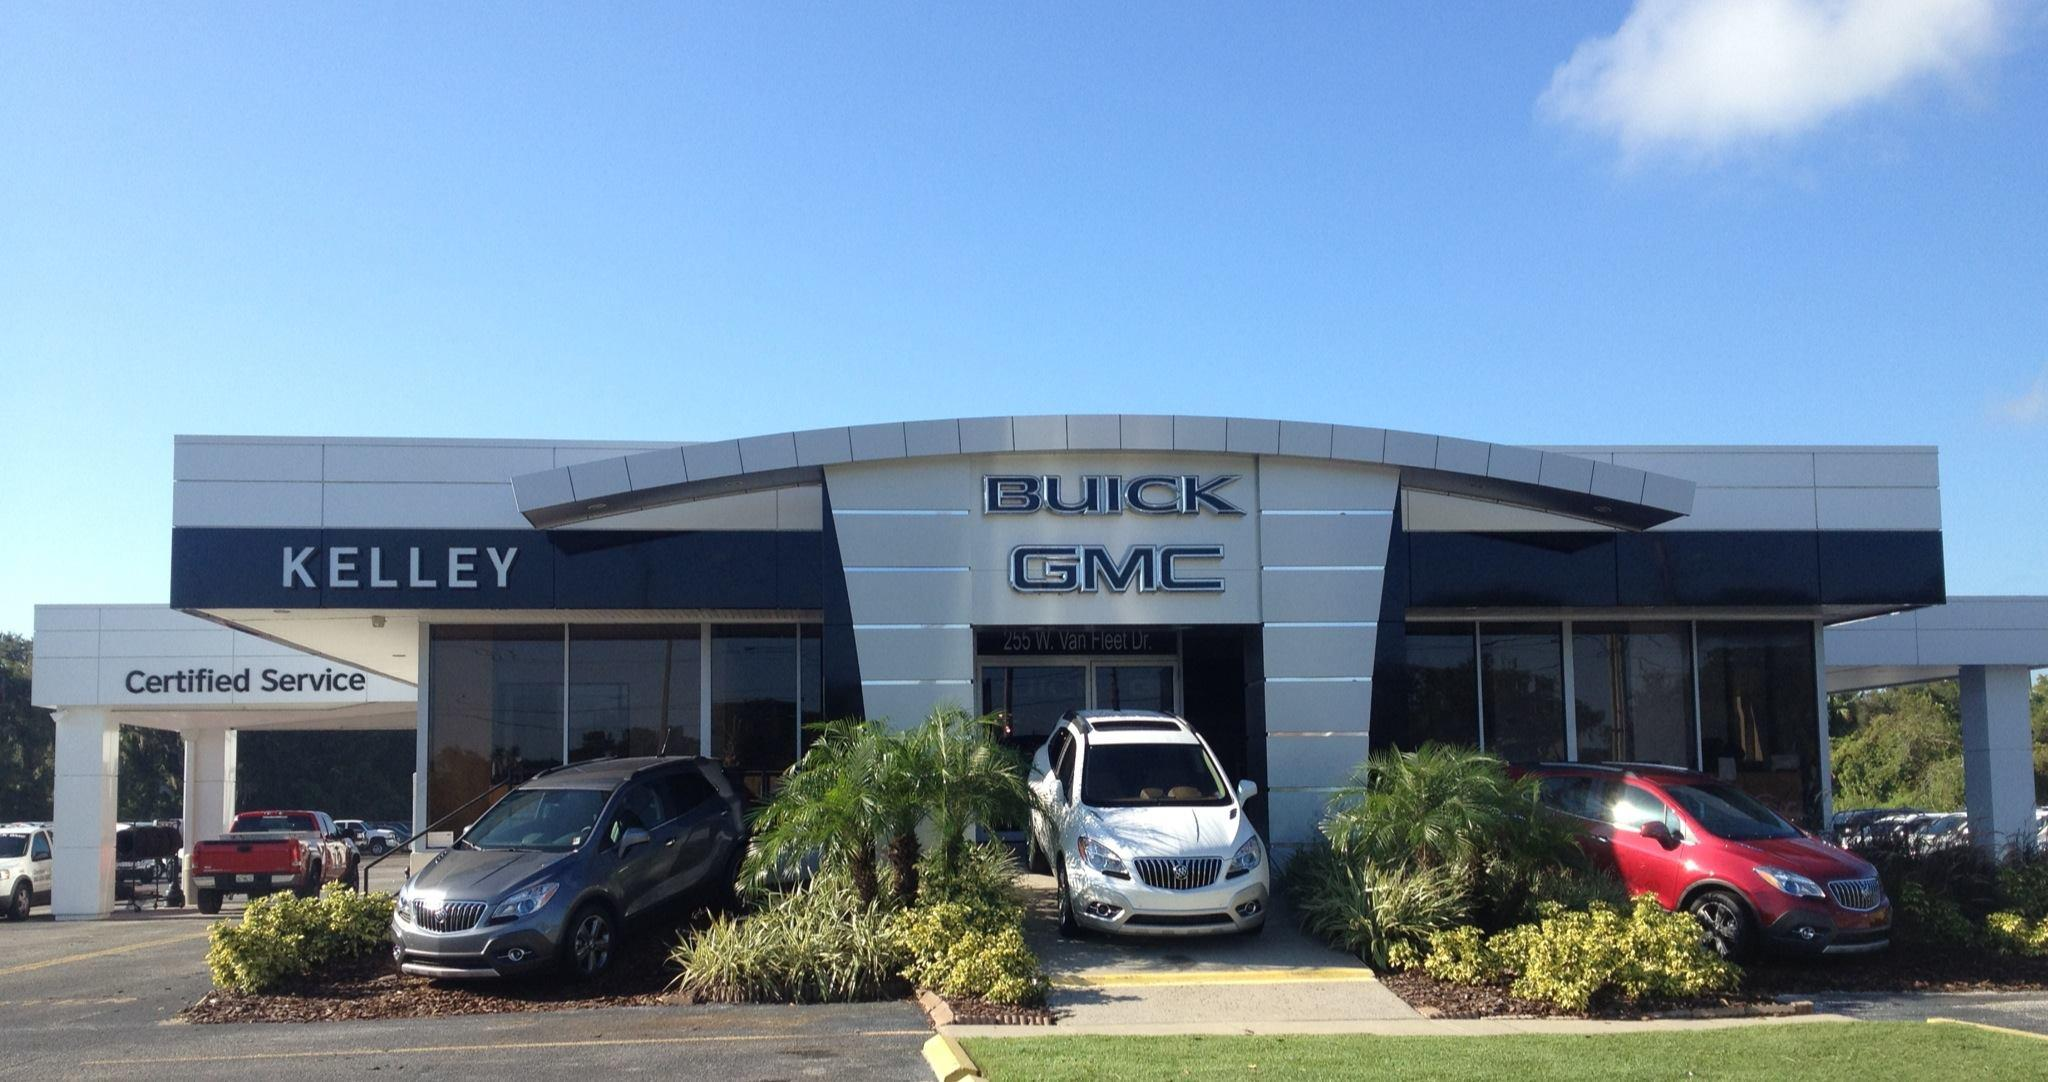 Kelley Buick GMC 255 W Van Fleet Dr Bartow FL Auto Dealers MapQuest